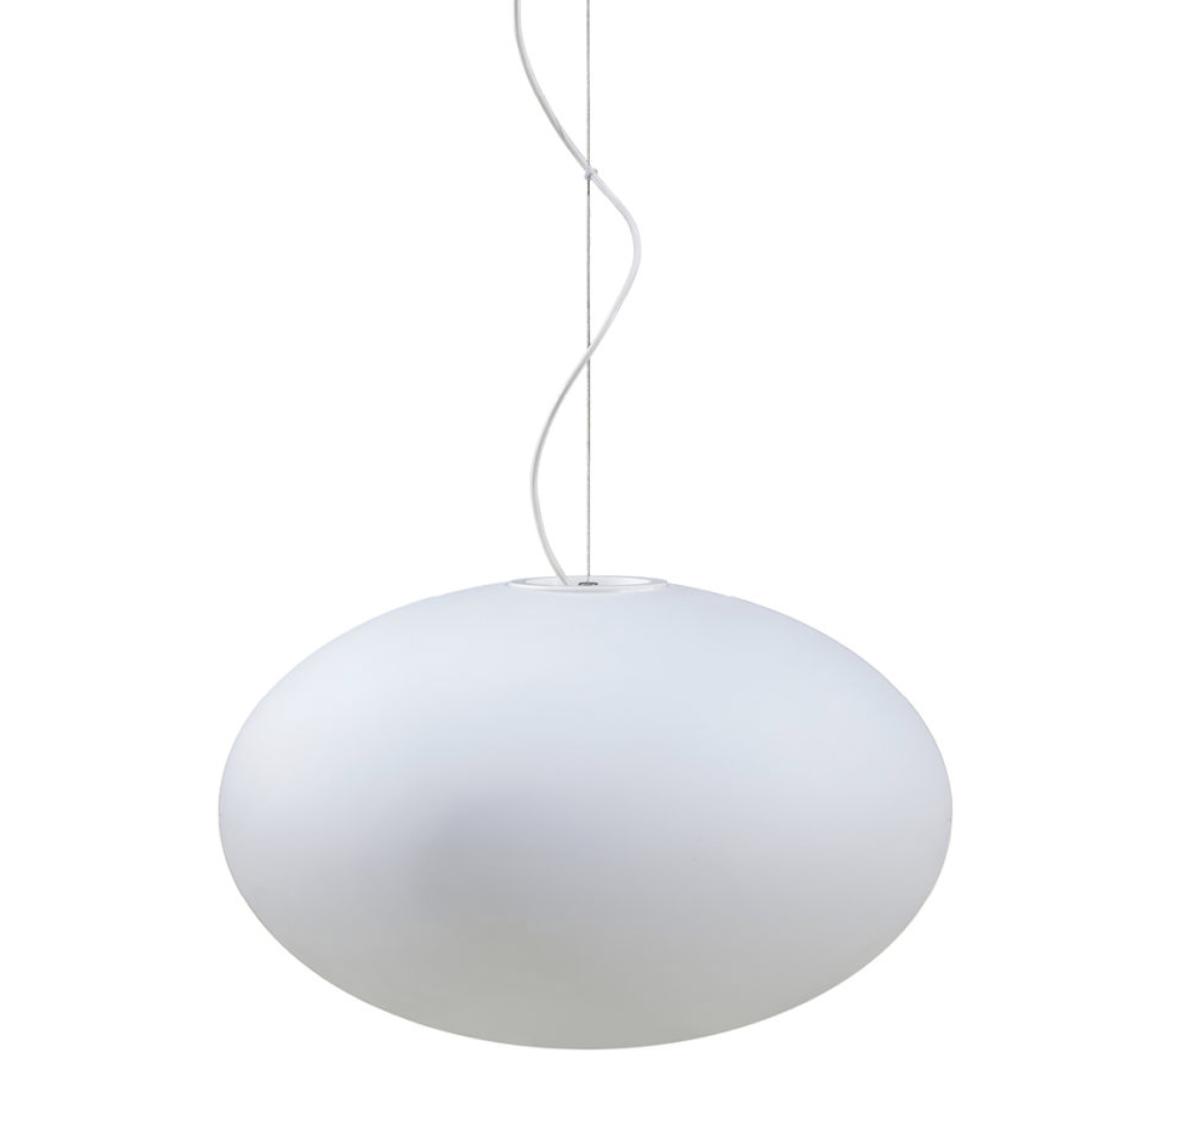 Eggy Pop Pendel - Ø55 6/7m